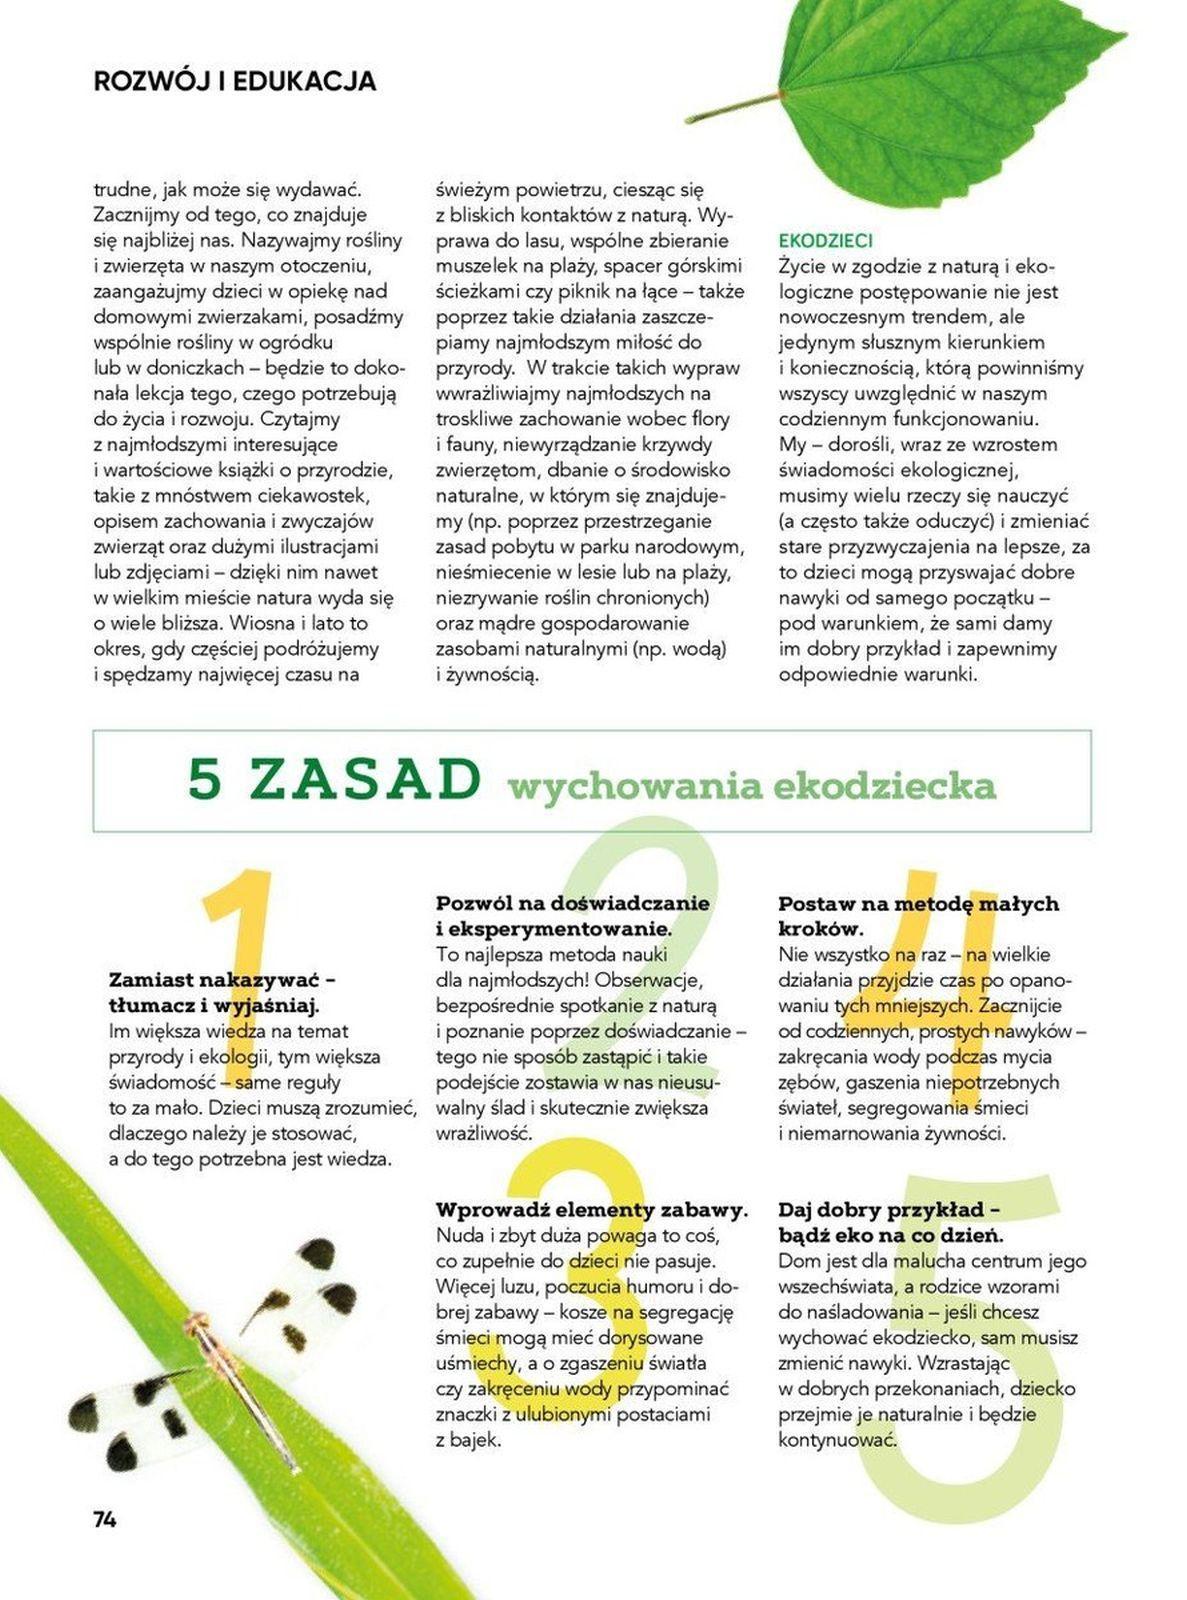 Gazetka promocyjna Tesco do 31/10/2019 str.74